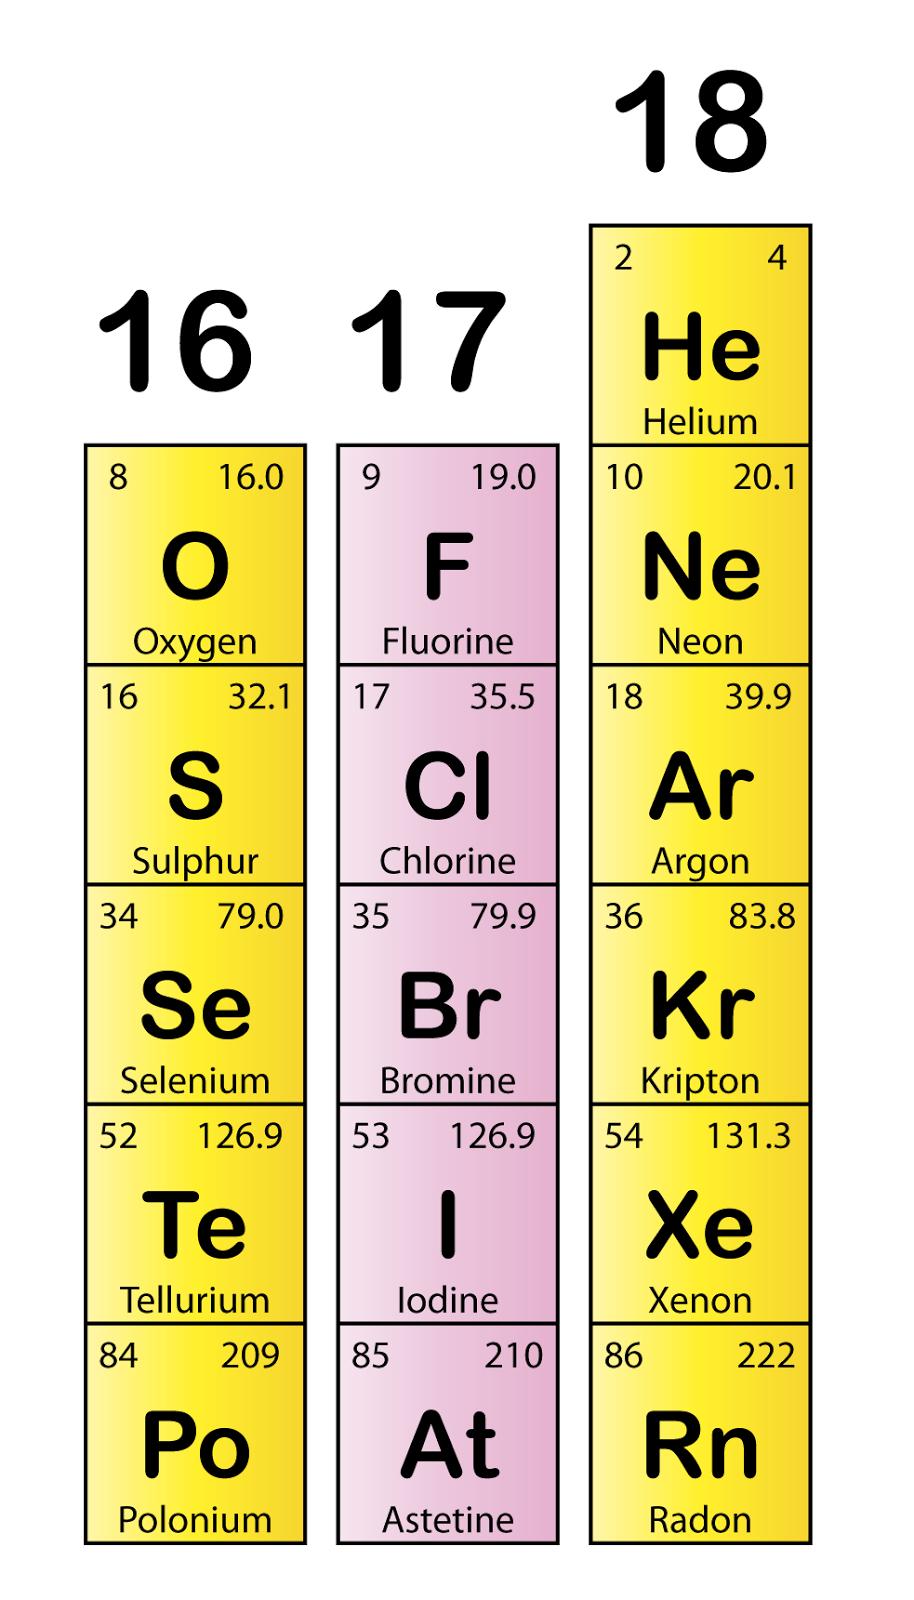 Halogens Group 9